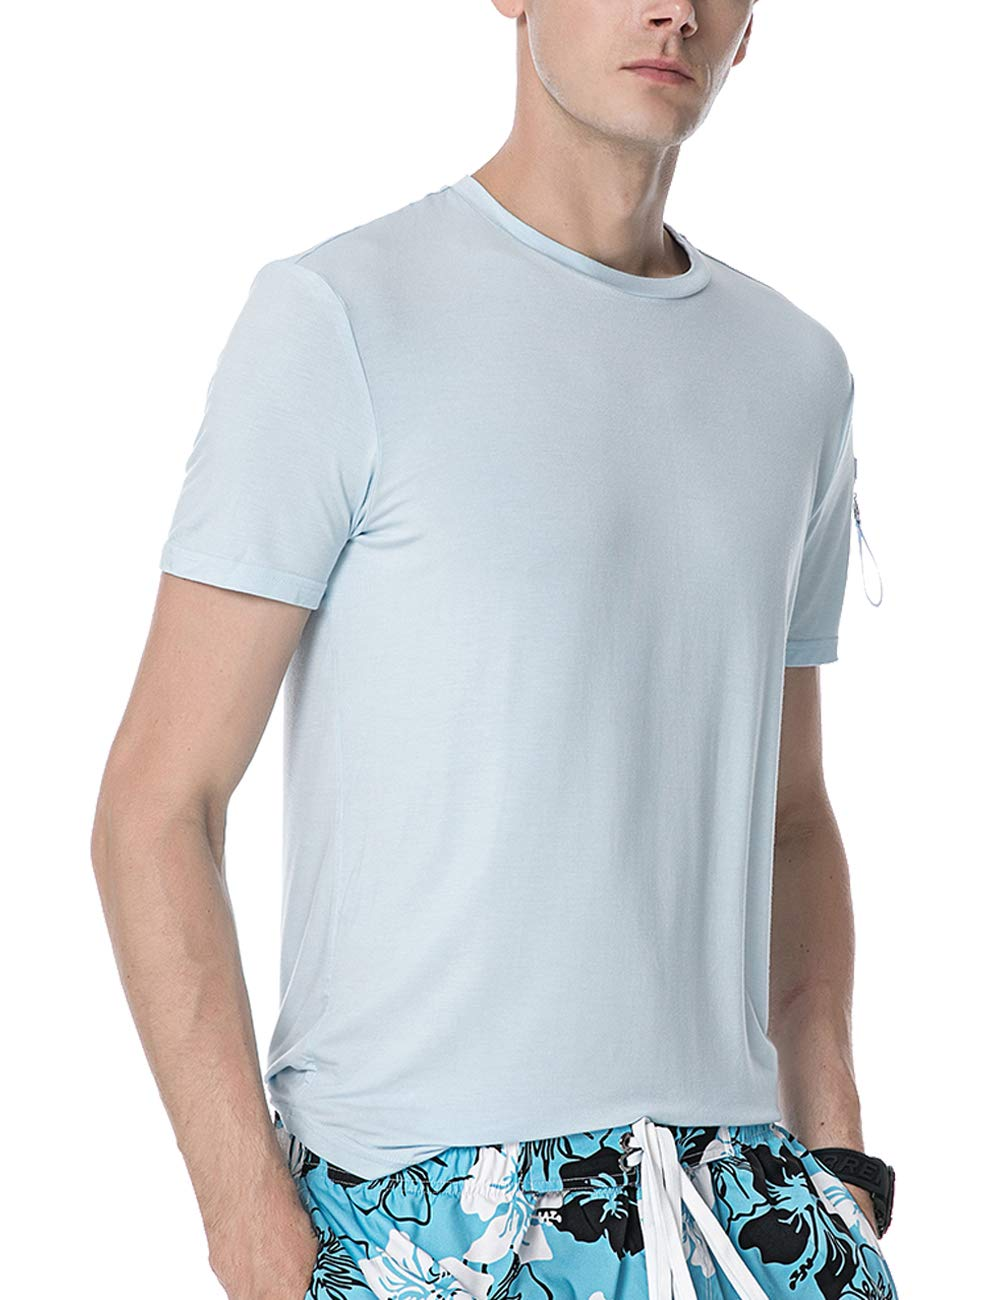 APRAW Mens Urban Hipster Hip Hop T Shirts Short Sleeves Cotton Longline Casual Tee Top Zipper Pocket